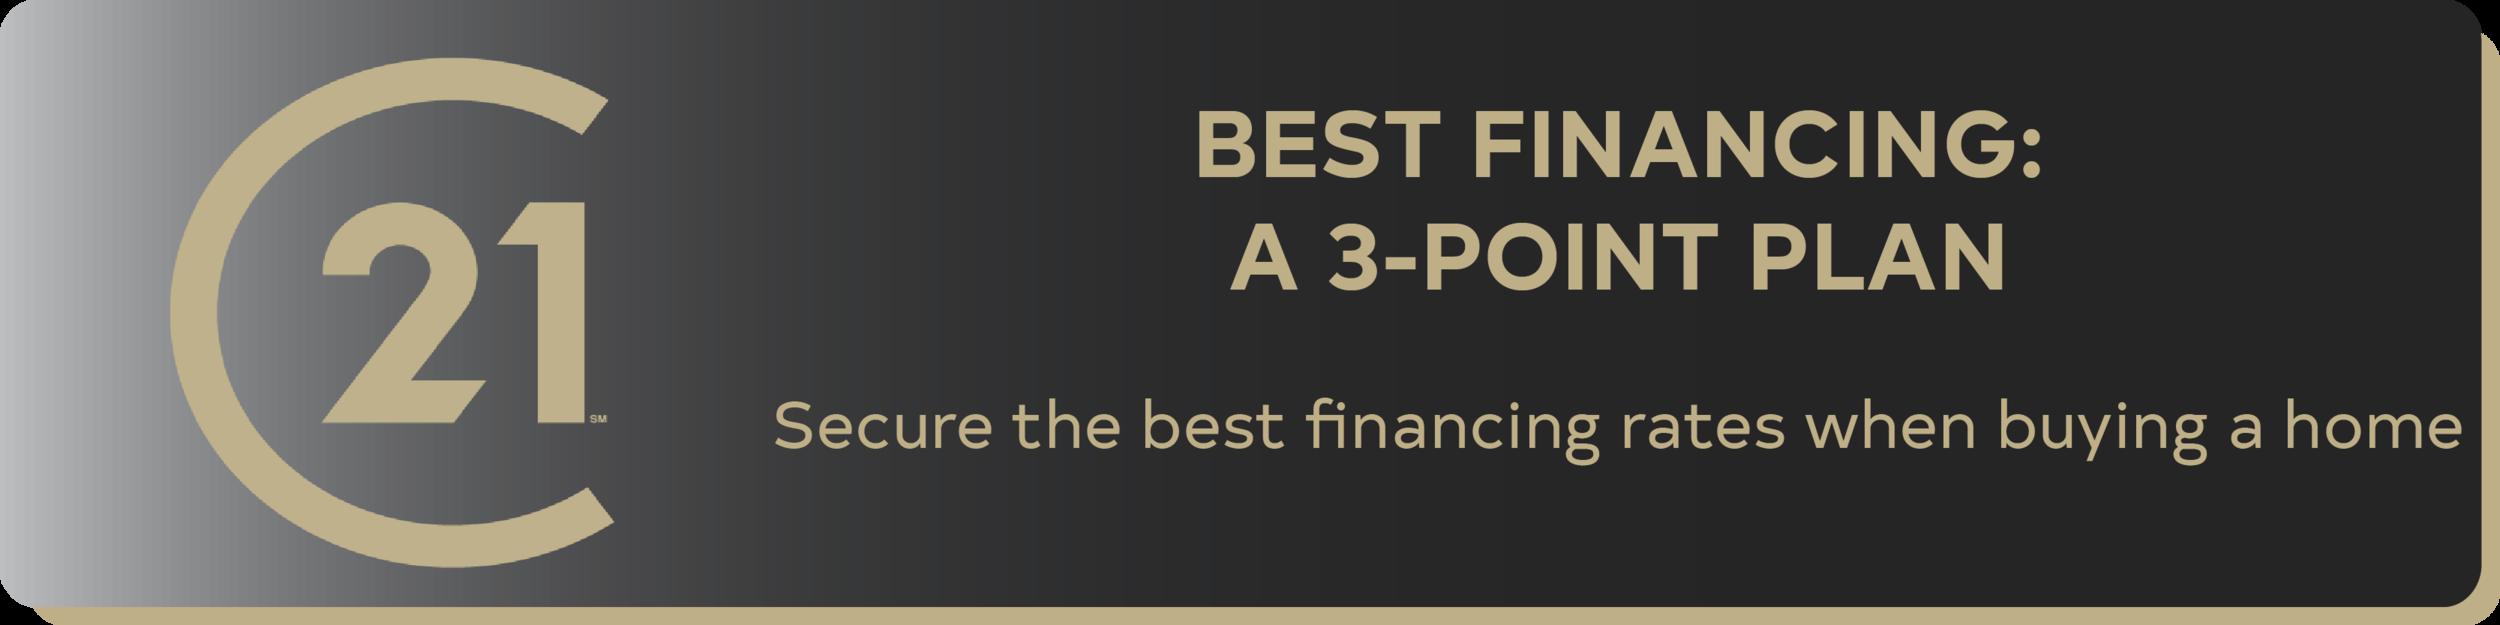 best financing.png